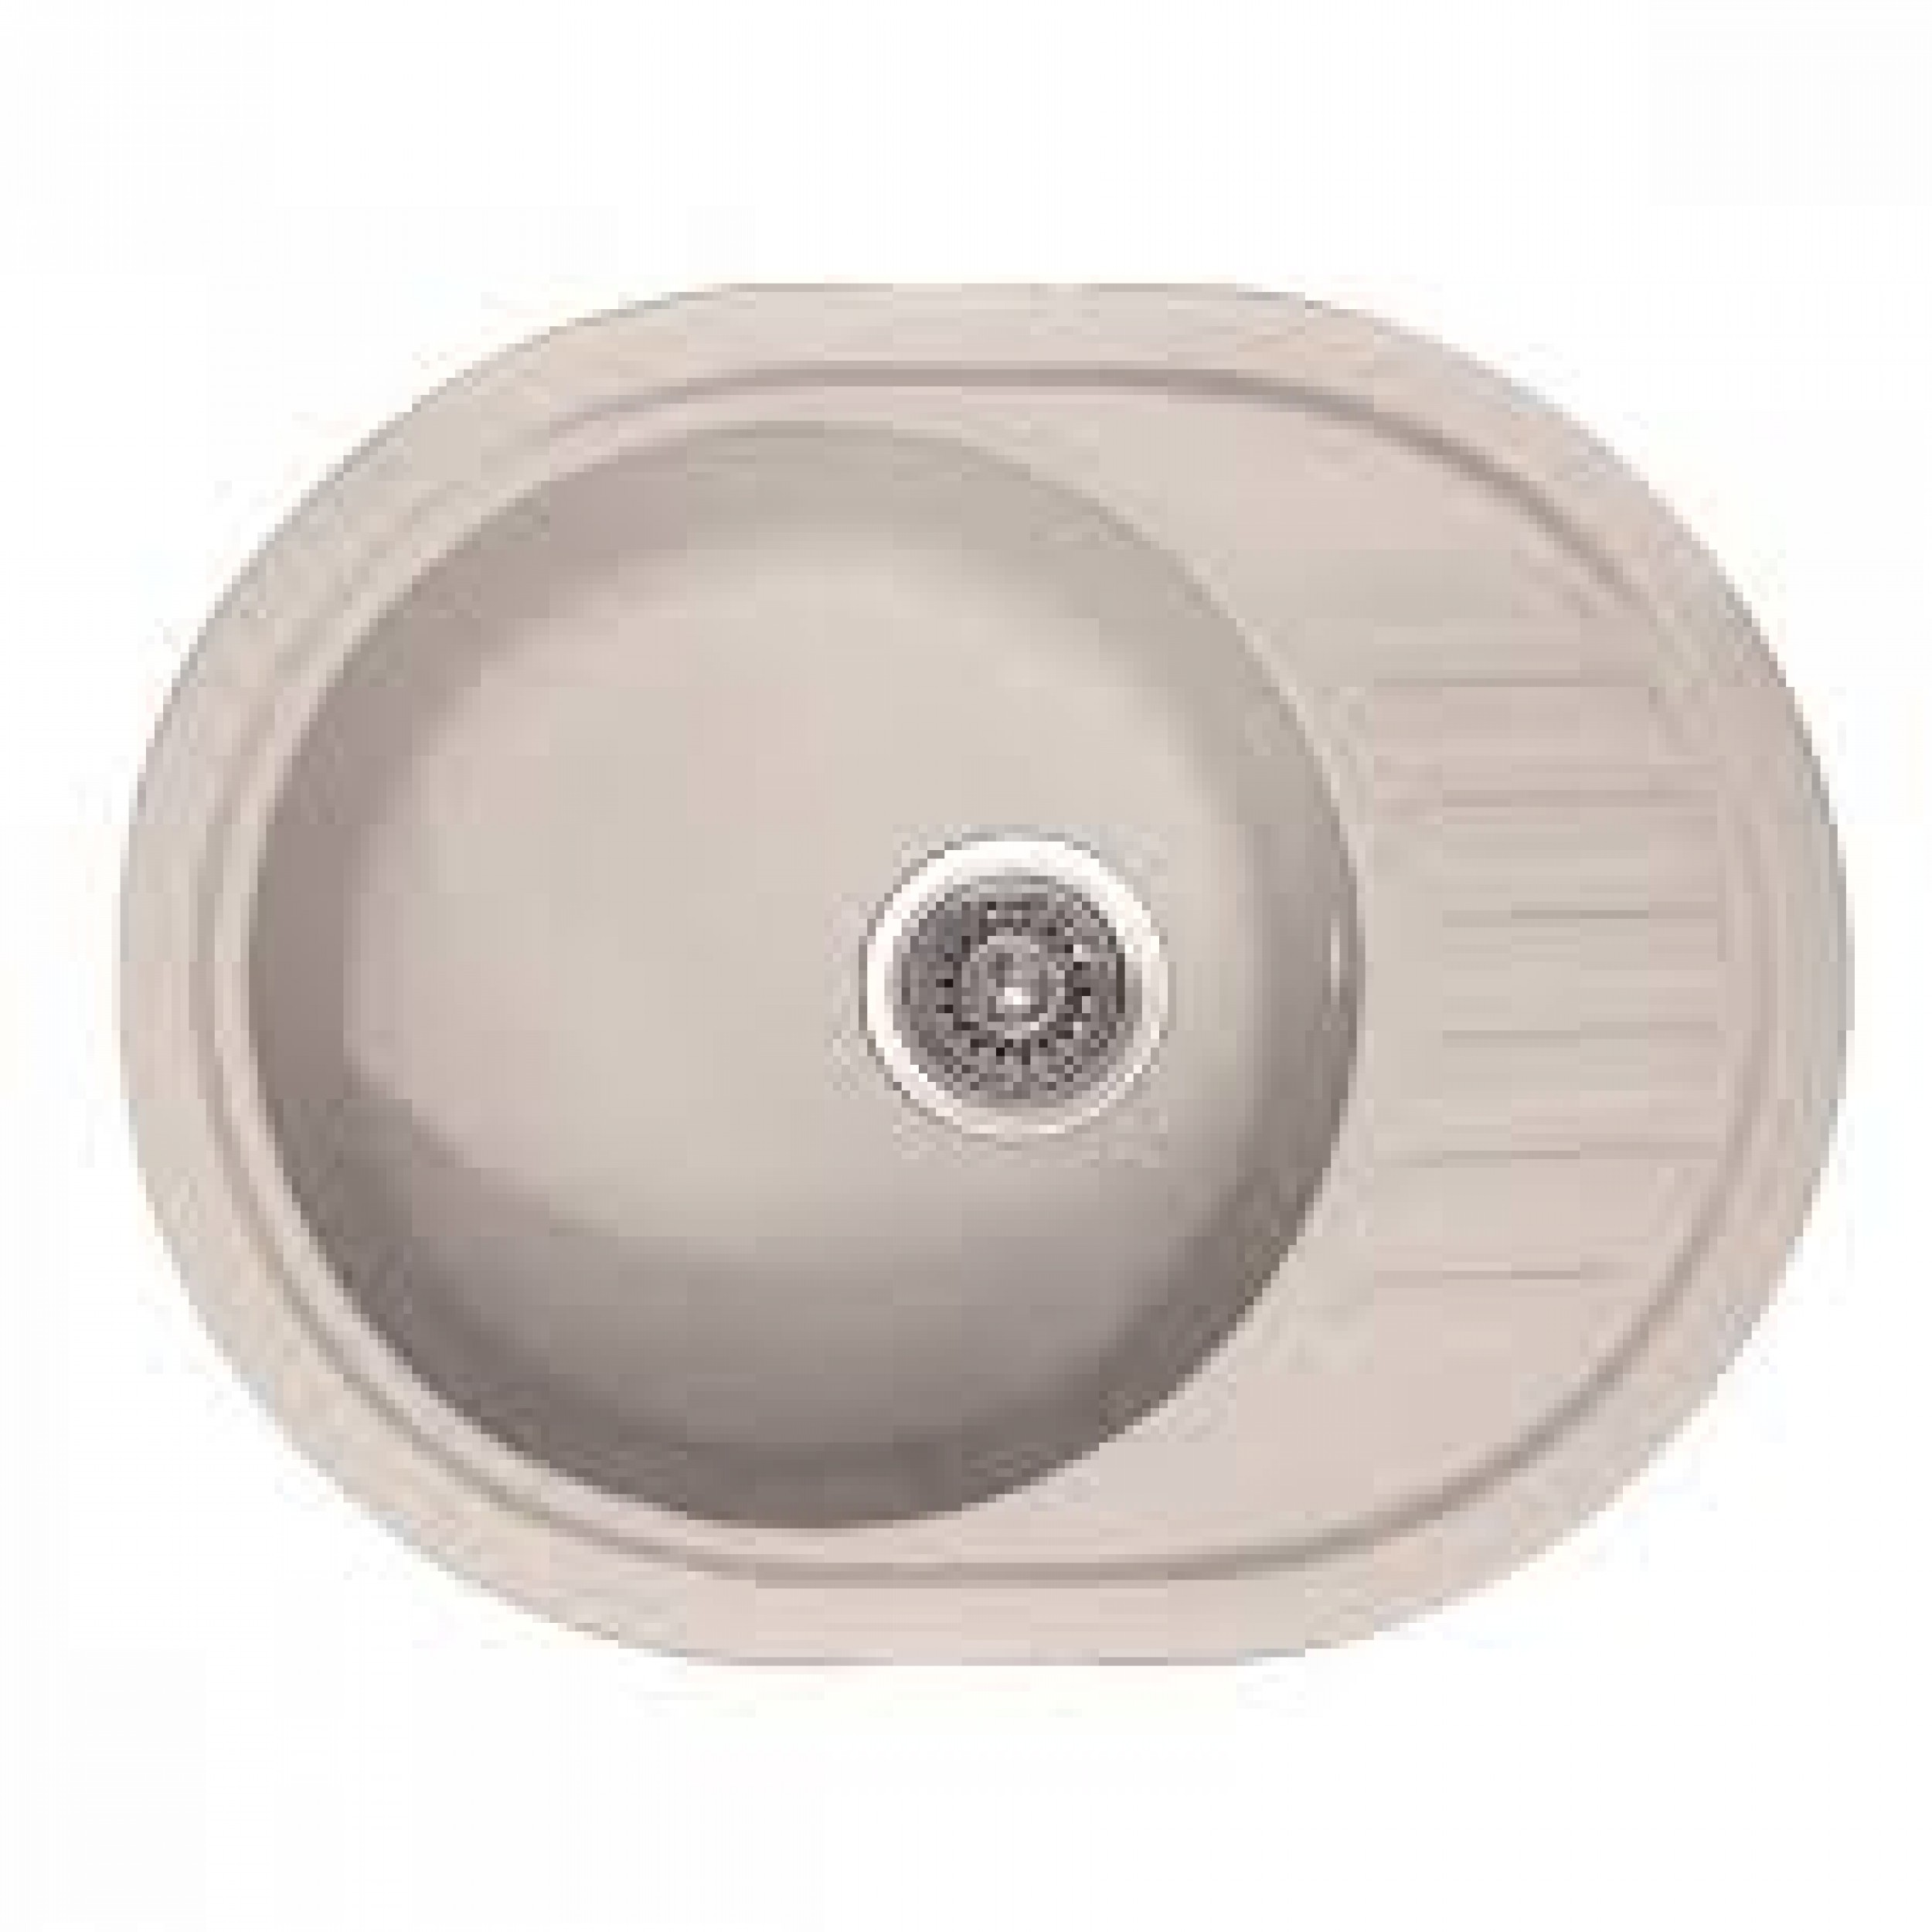 Chiuveta de bucatarie din piatra Mixxus, HB8311-G322 BEIGE 570x450x180